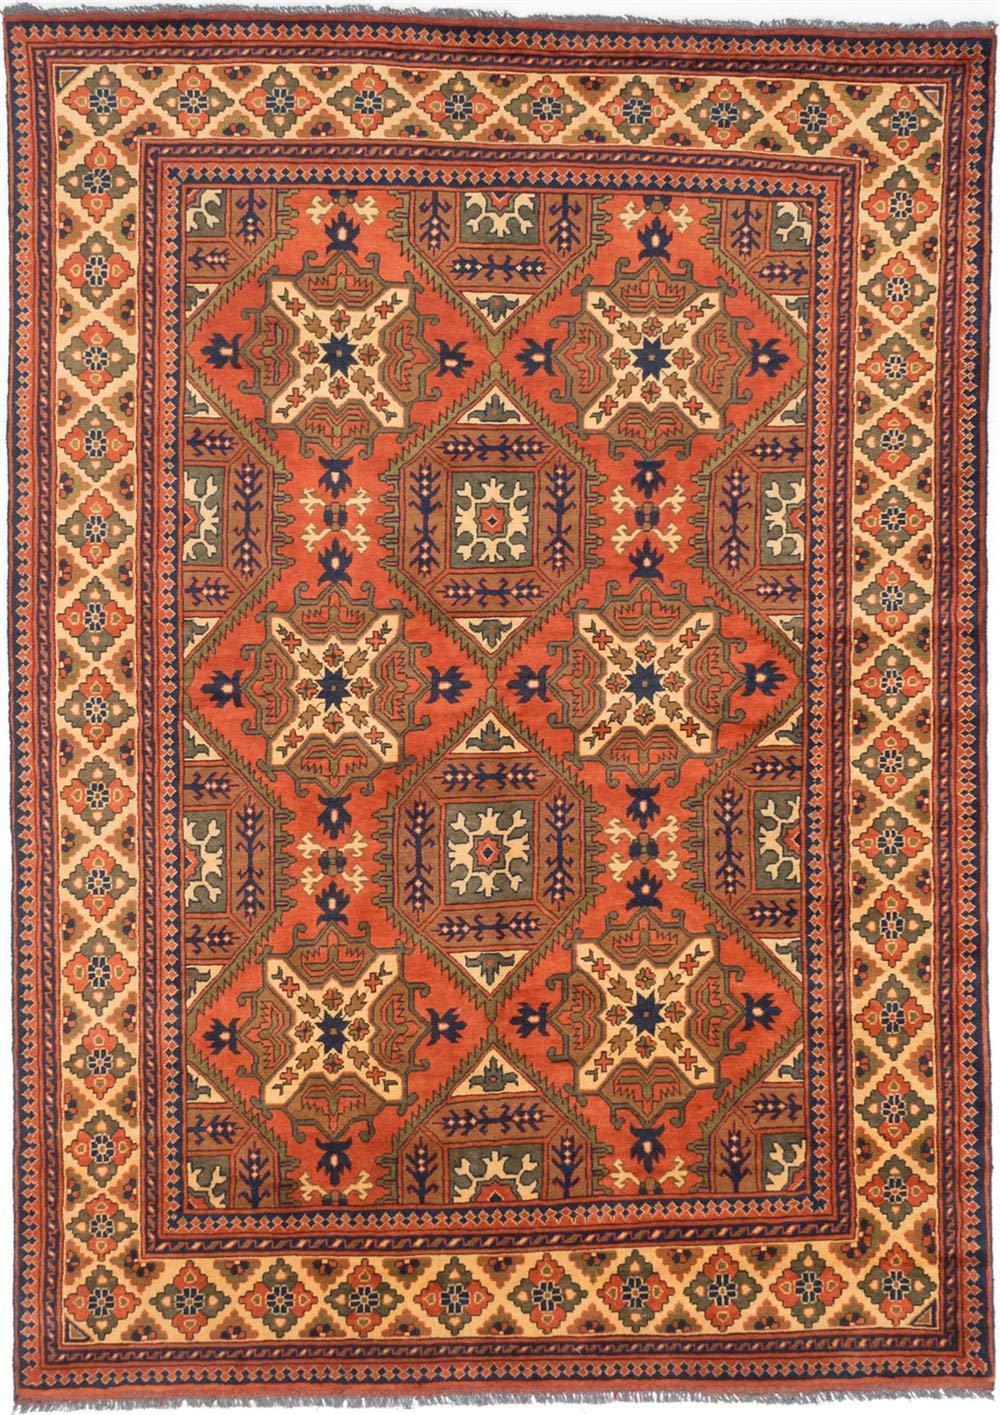 "eCarpet Gallery Large Area Rug for Living Room, Bedroom   Hand-Knotted Wool Rug   Finest Kargahi Traditional Brown Rug 6'9"" x 9'4""   203172"